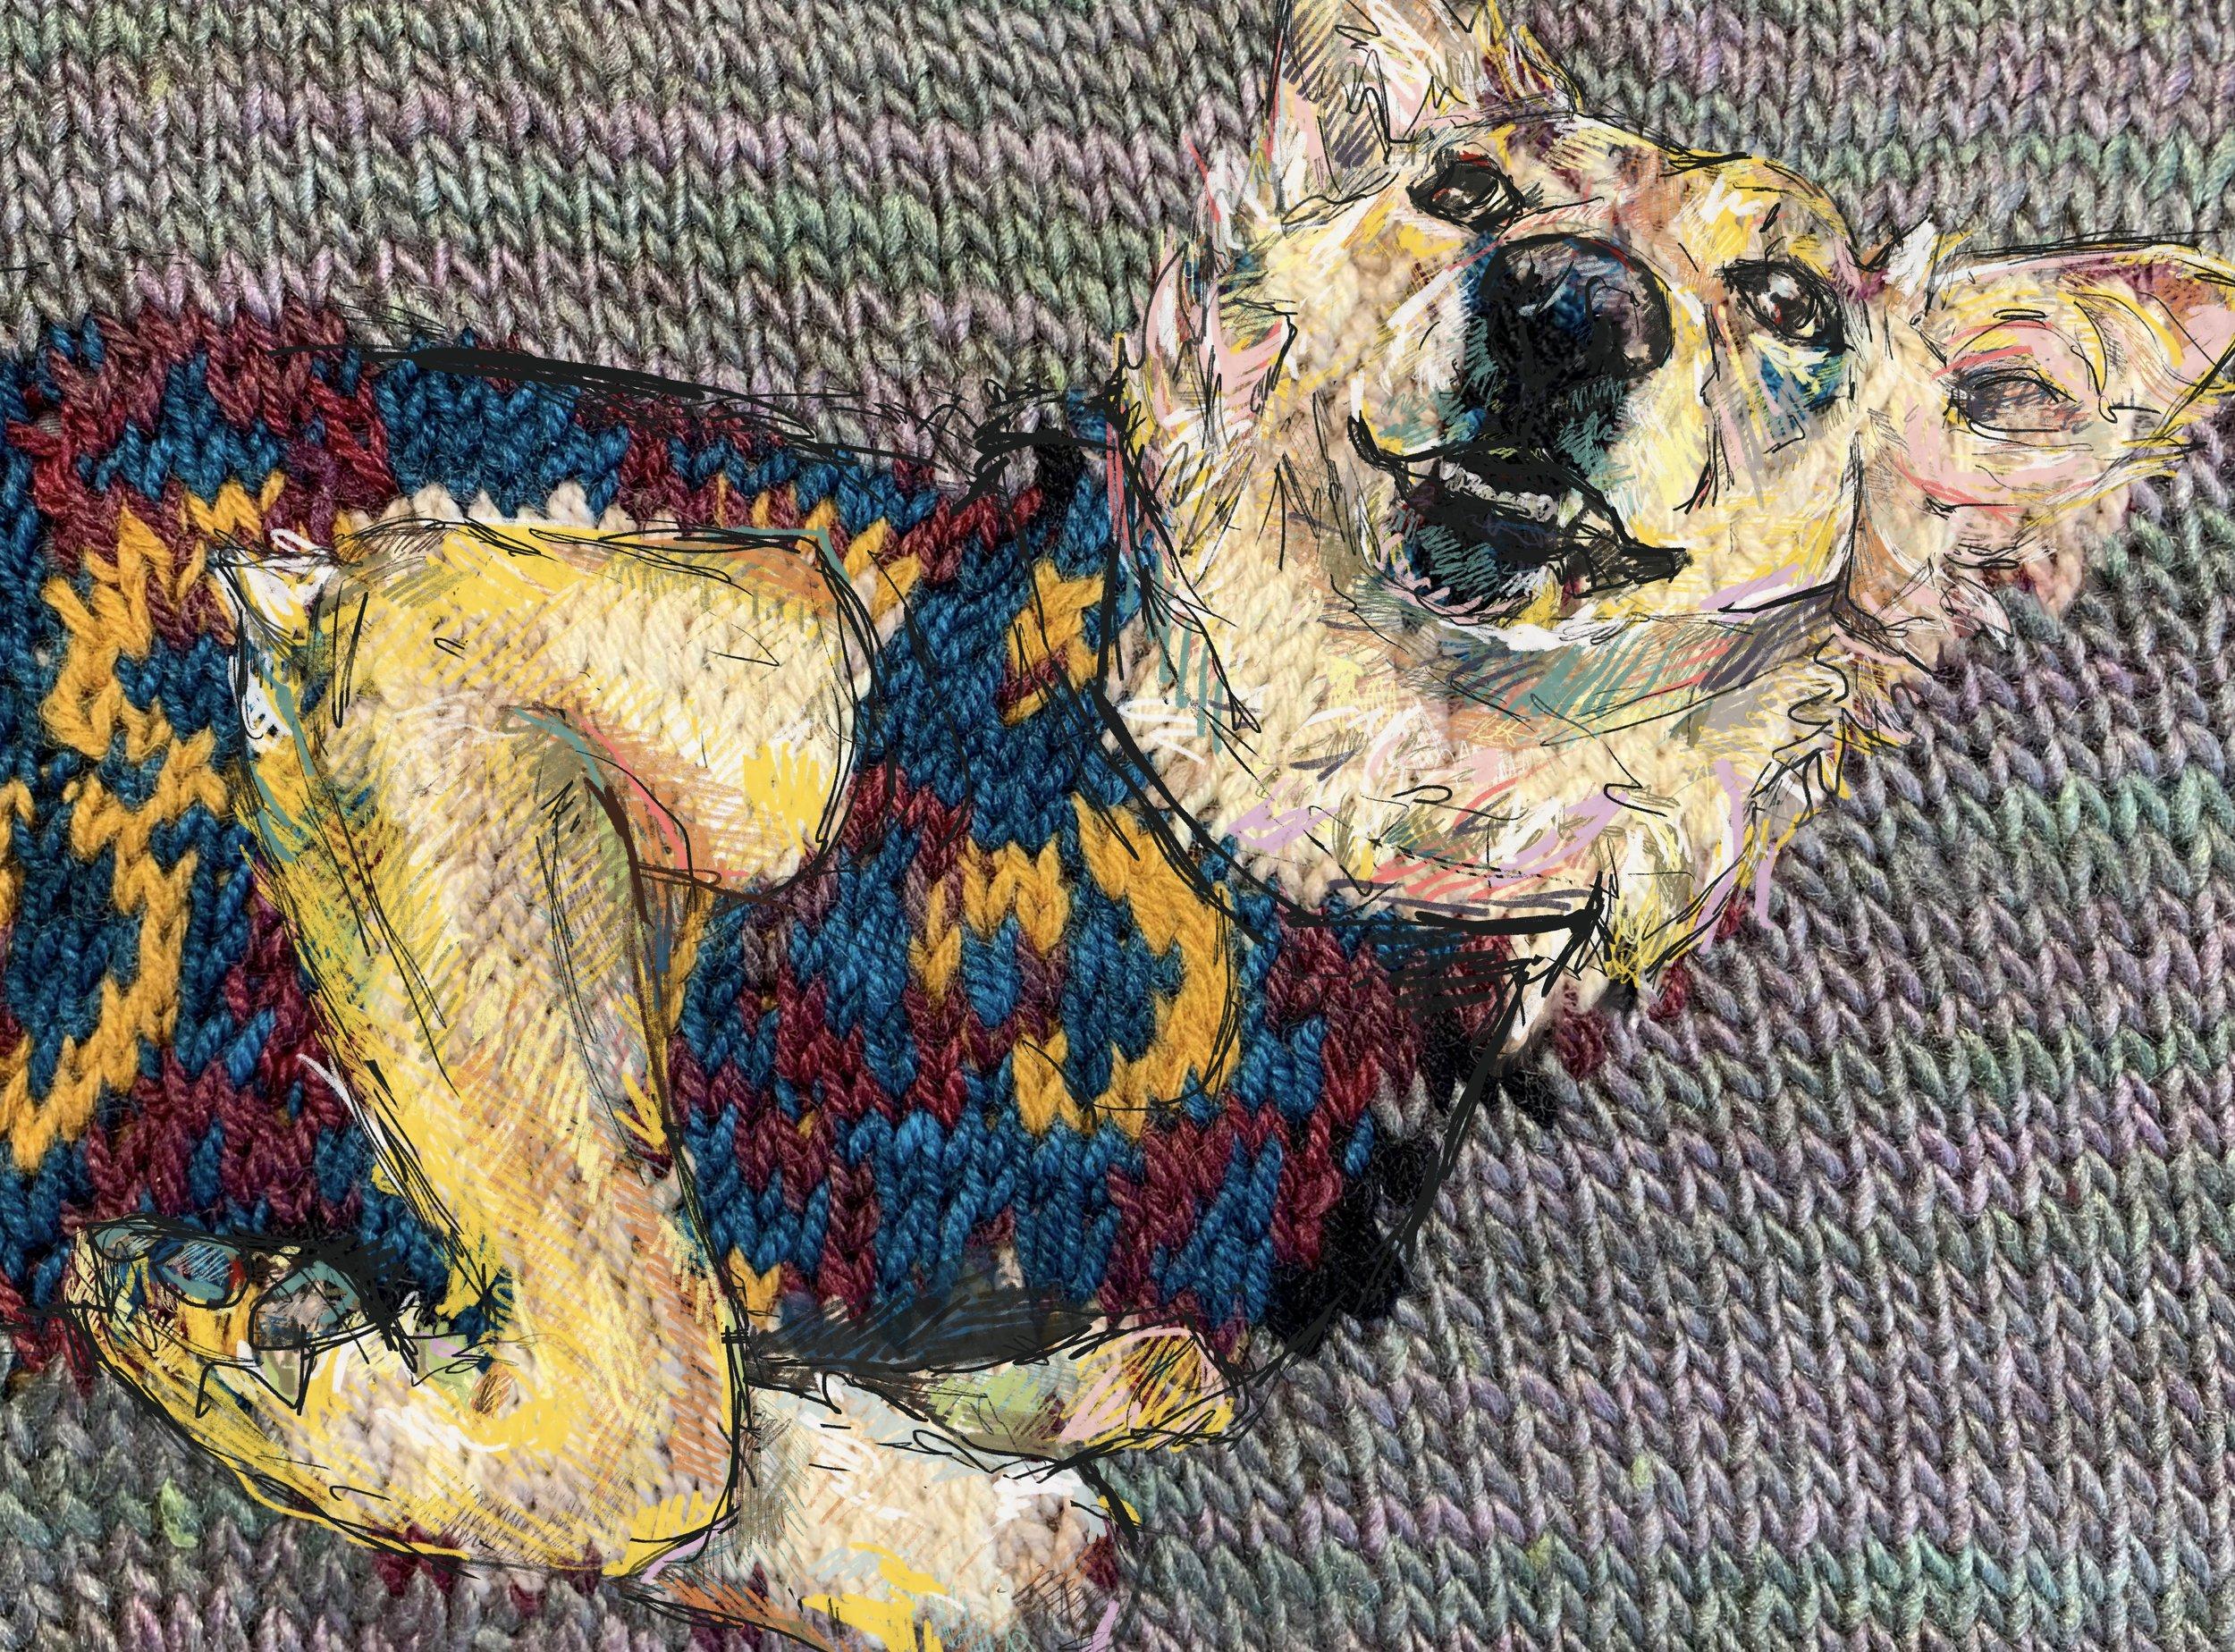 faith portrait pet dog shelter dog knit knitting sweater.jpg